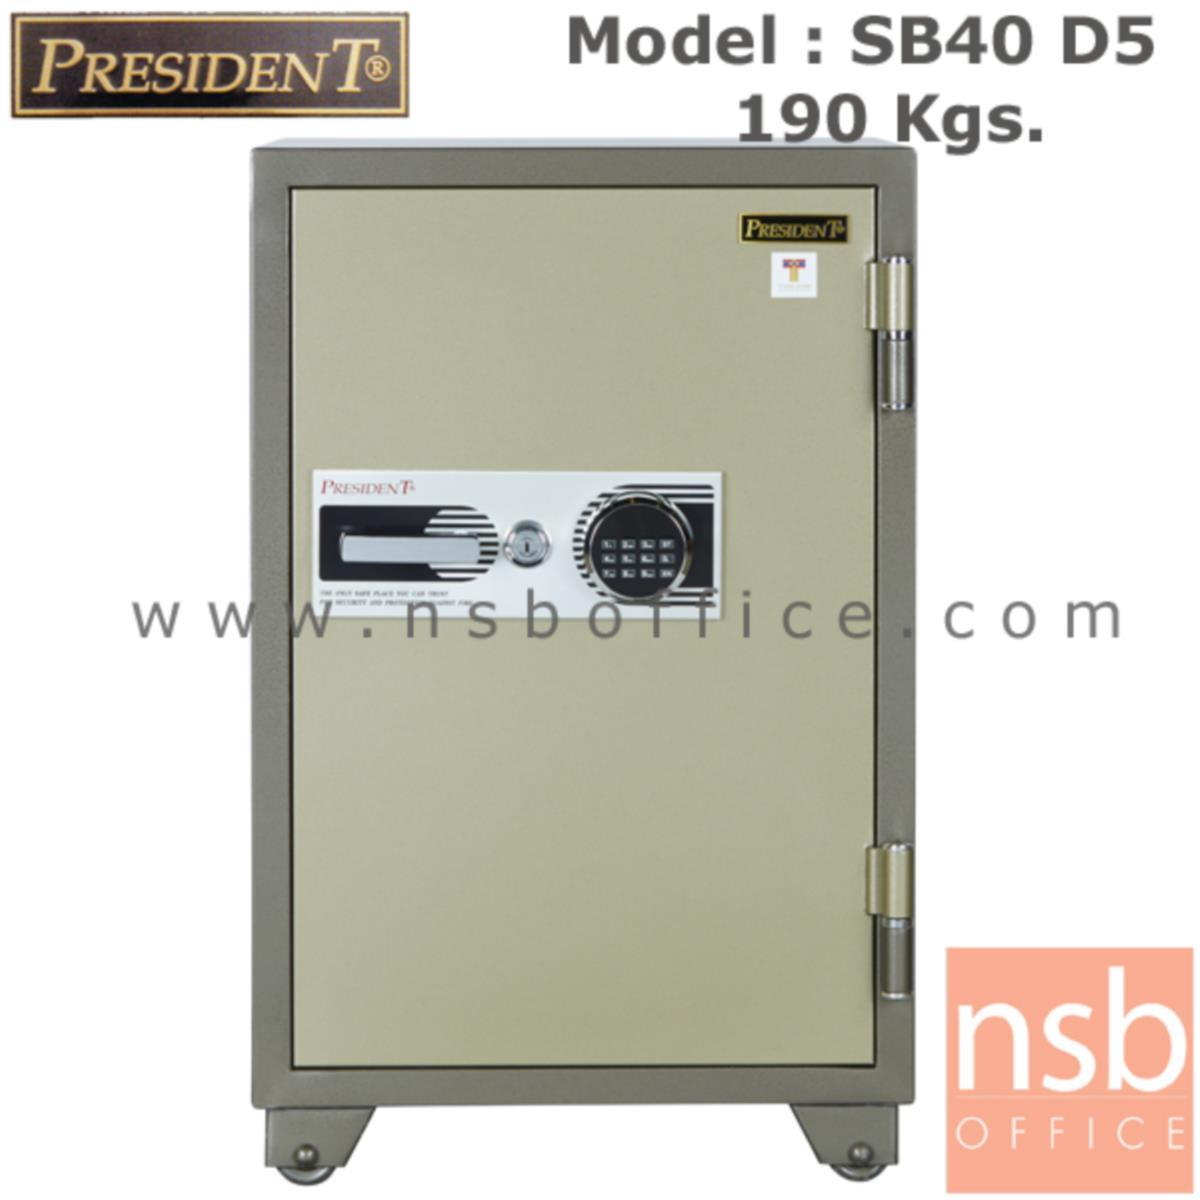 F05A062:ตู้เซฟนิรภัยชนิดดิจิตอลแบบใหม่ 190 กก. รุ่น PRESIDENT-SB40D5  มี 1 กุญแจ 1 รหัส (รหัสใช้กดหน้าตู้)